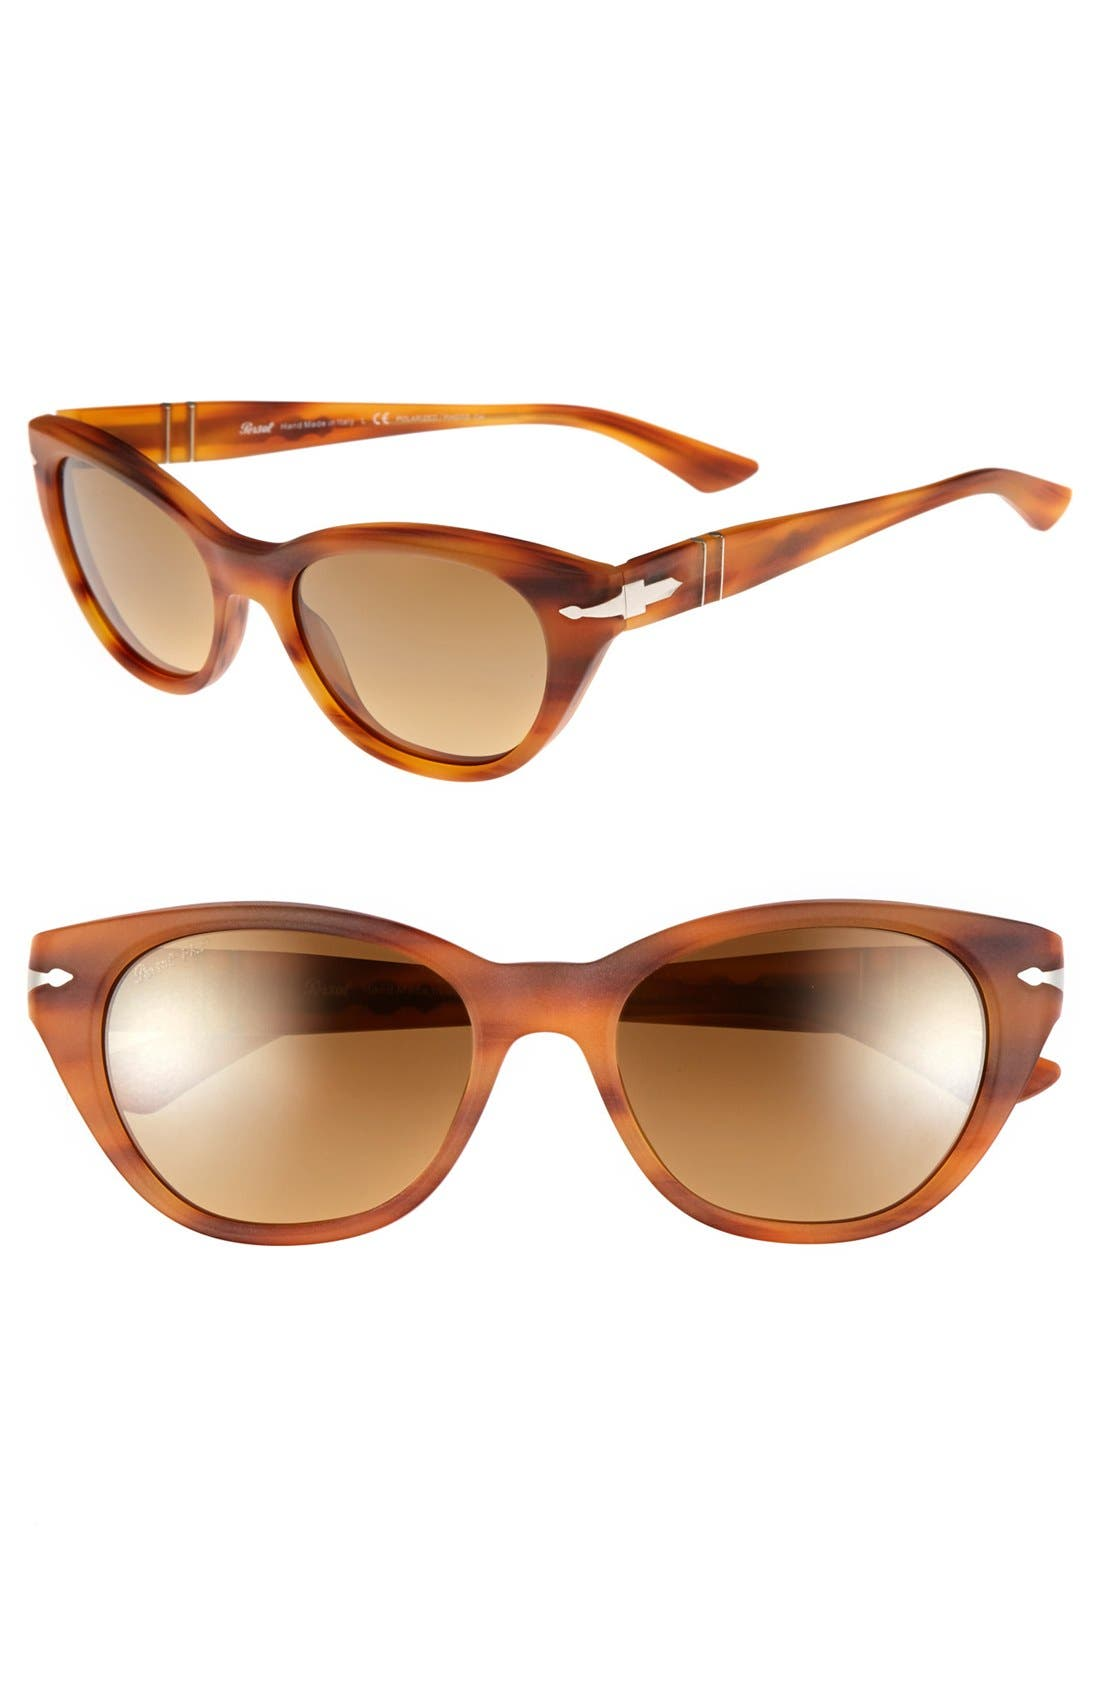 Alternate Image 1 Selected - Persol 'Suprema' 53mm Polarized Sunglasses